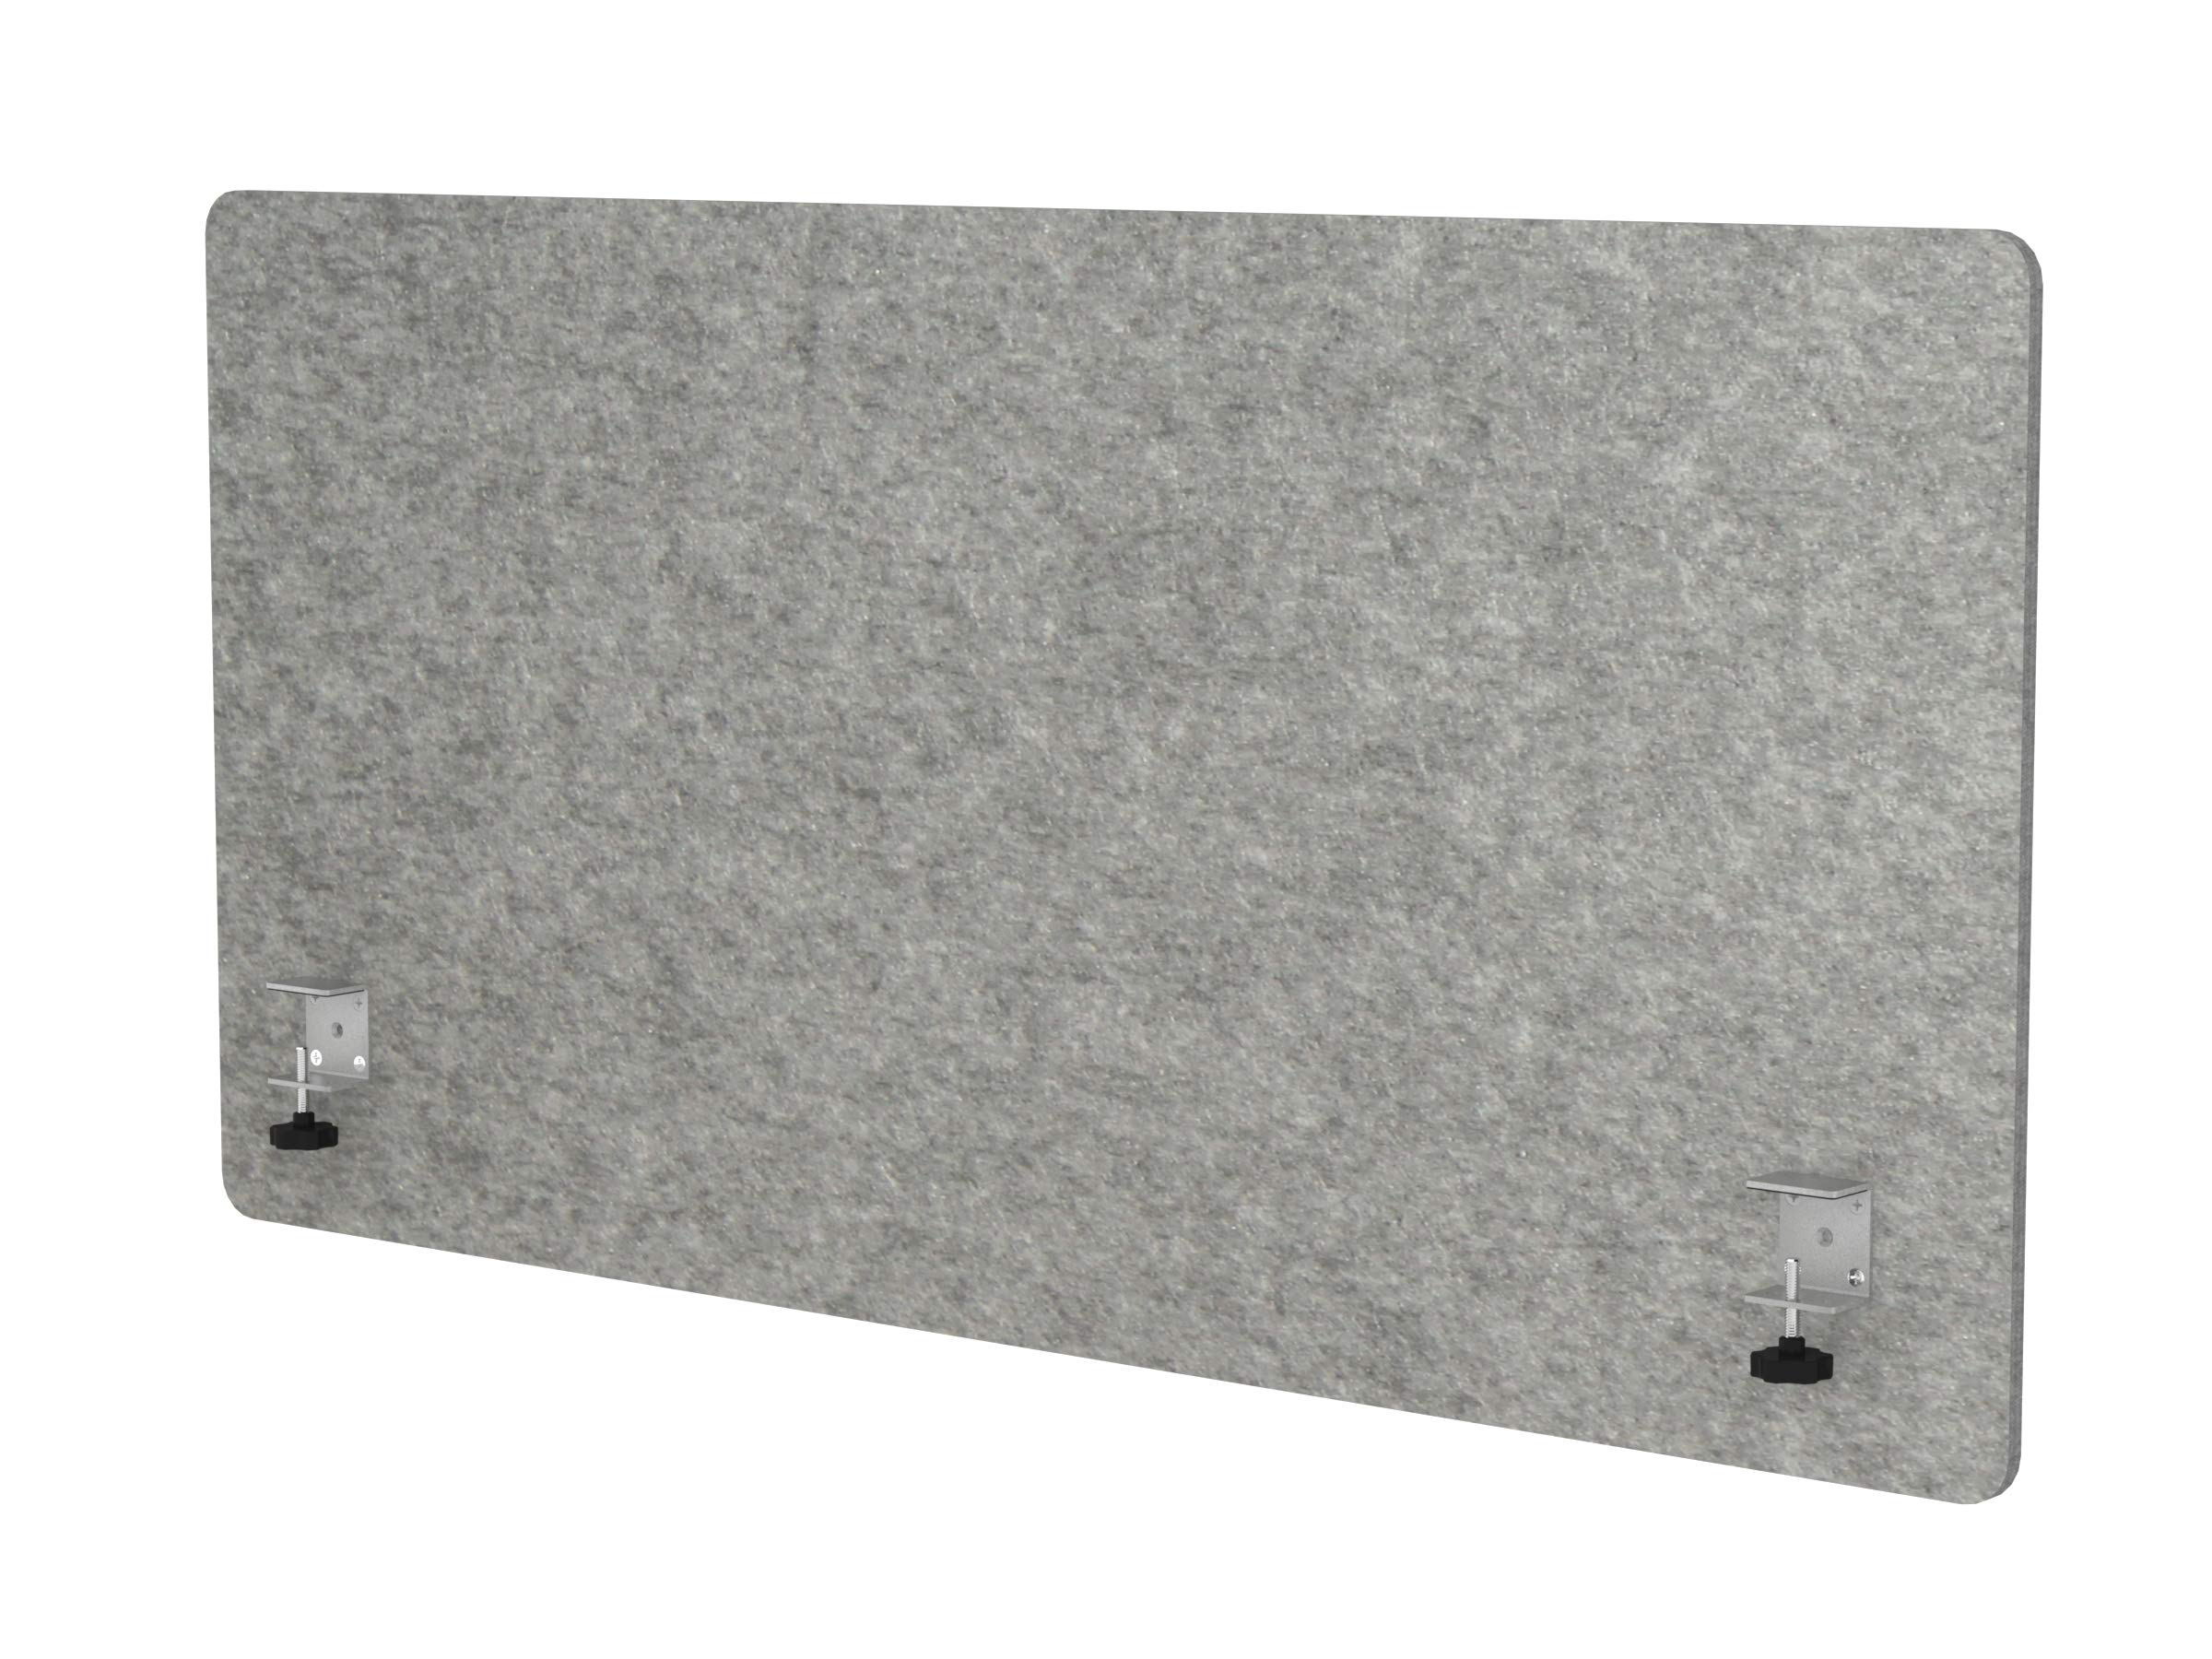 "VaRoom Acoustic Partition, Sound Absorbing Desk Divider – 48"" W x 24""H Privacy Desk Mounted Cubicle Panel, Ash Grey by VaRoom (Image #3)"